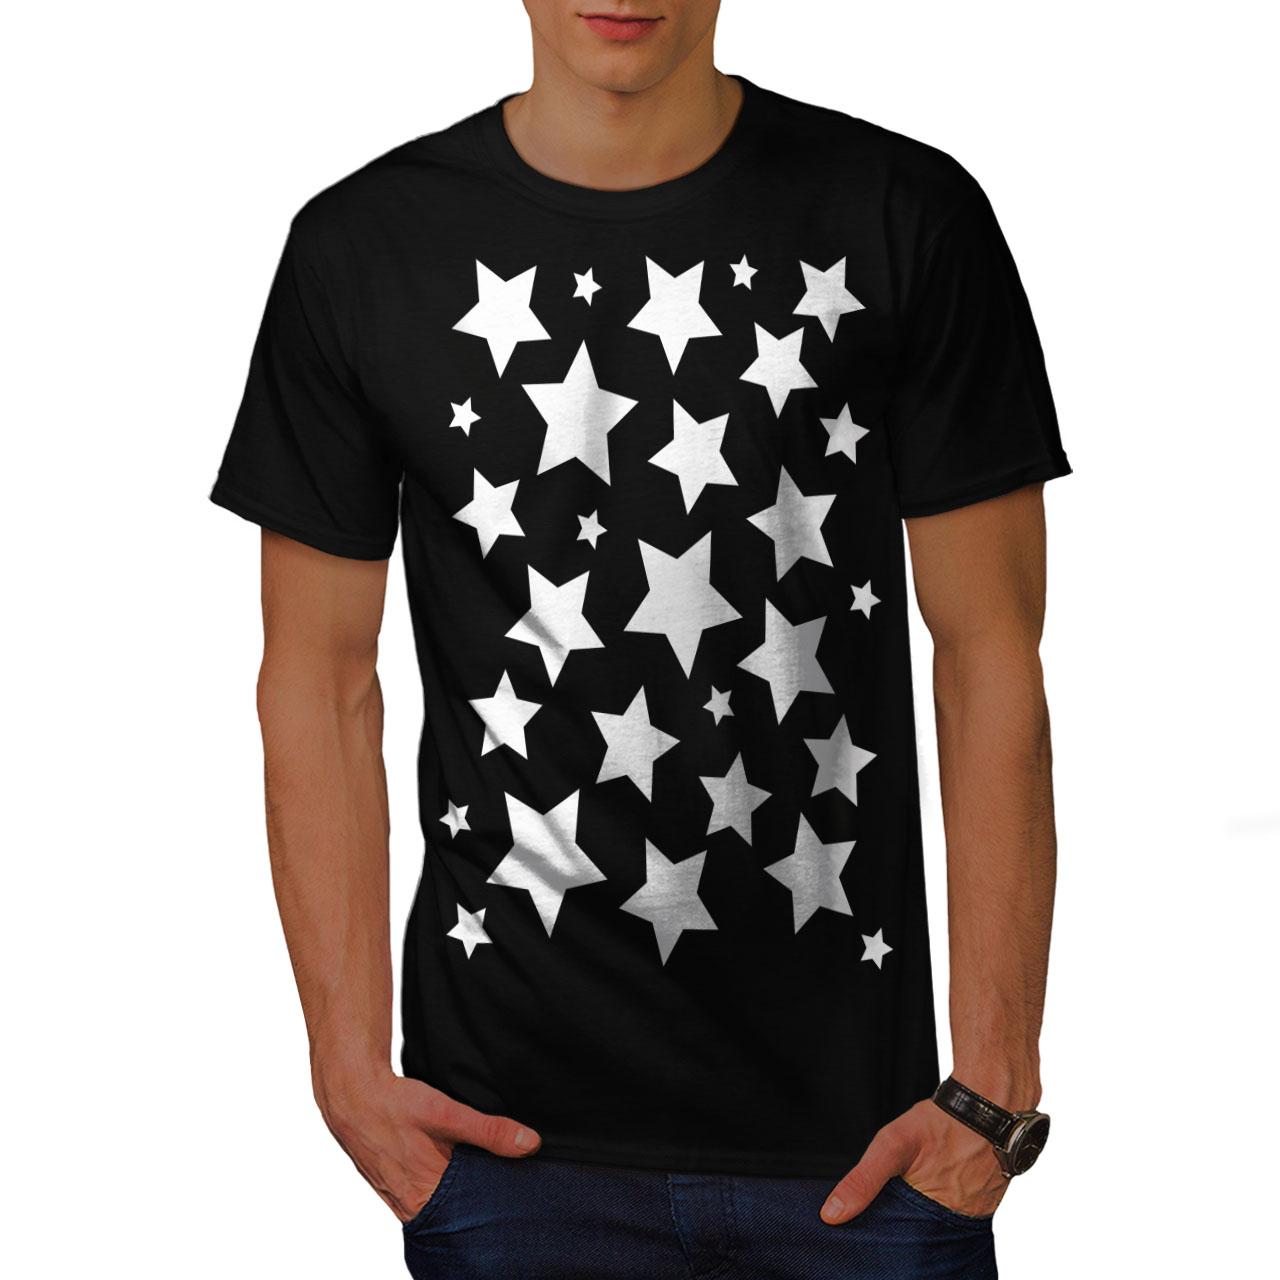 Wellcoda Star Shine Mens Long Sleeve T-shirt Pattern Graphic Design